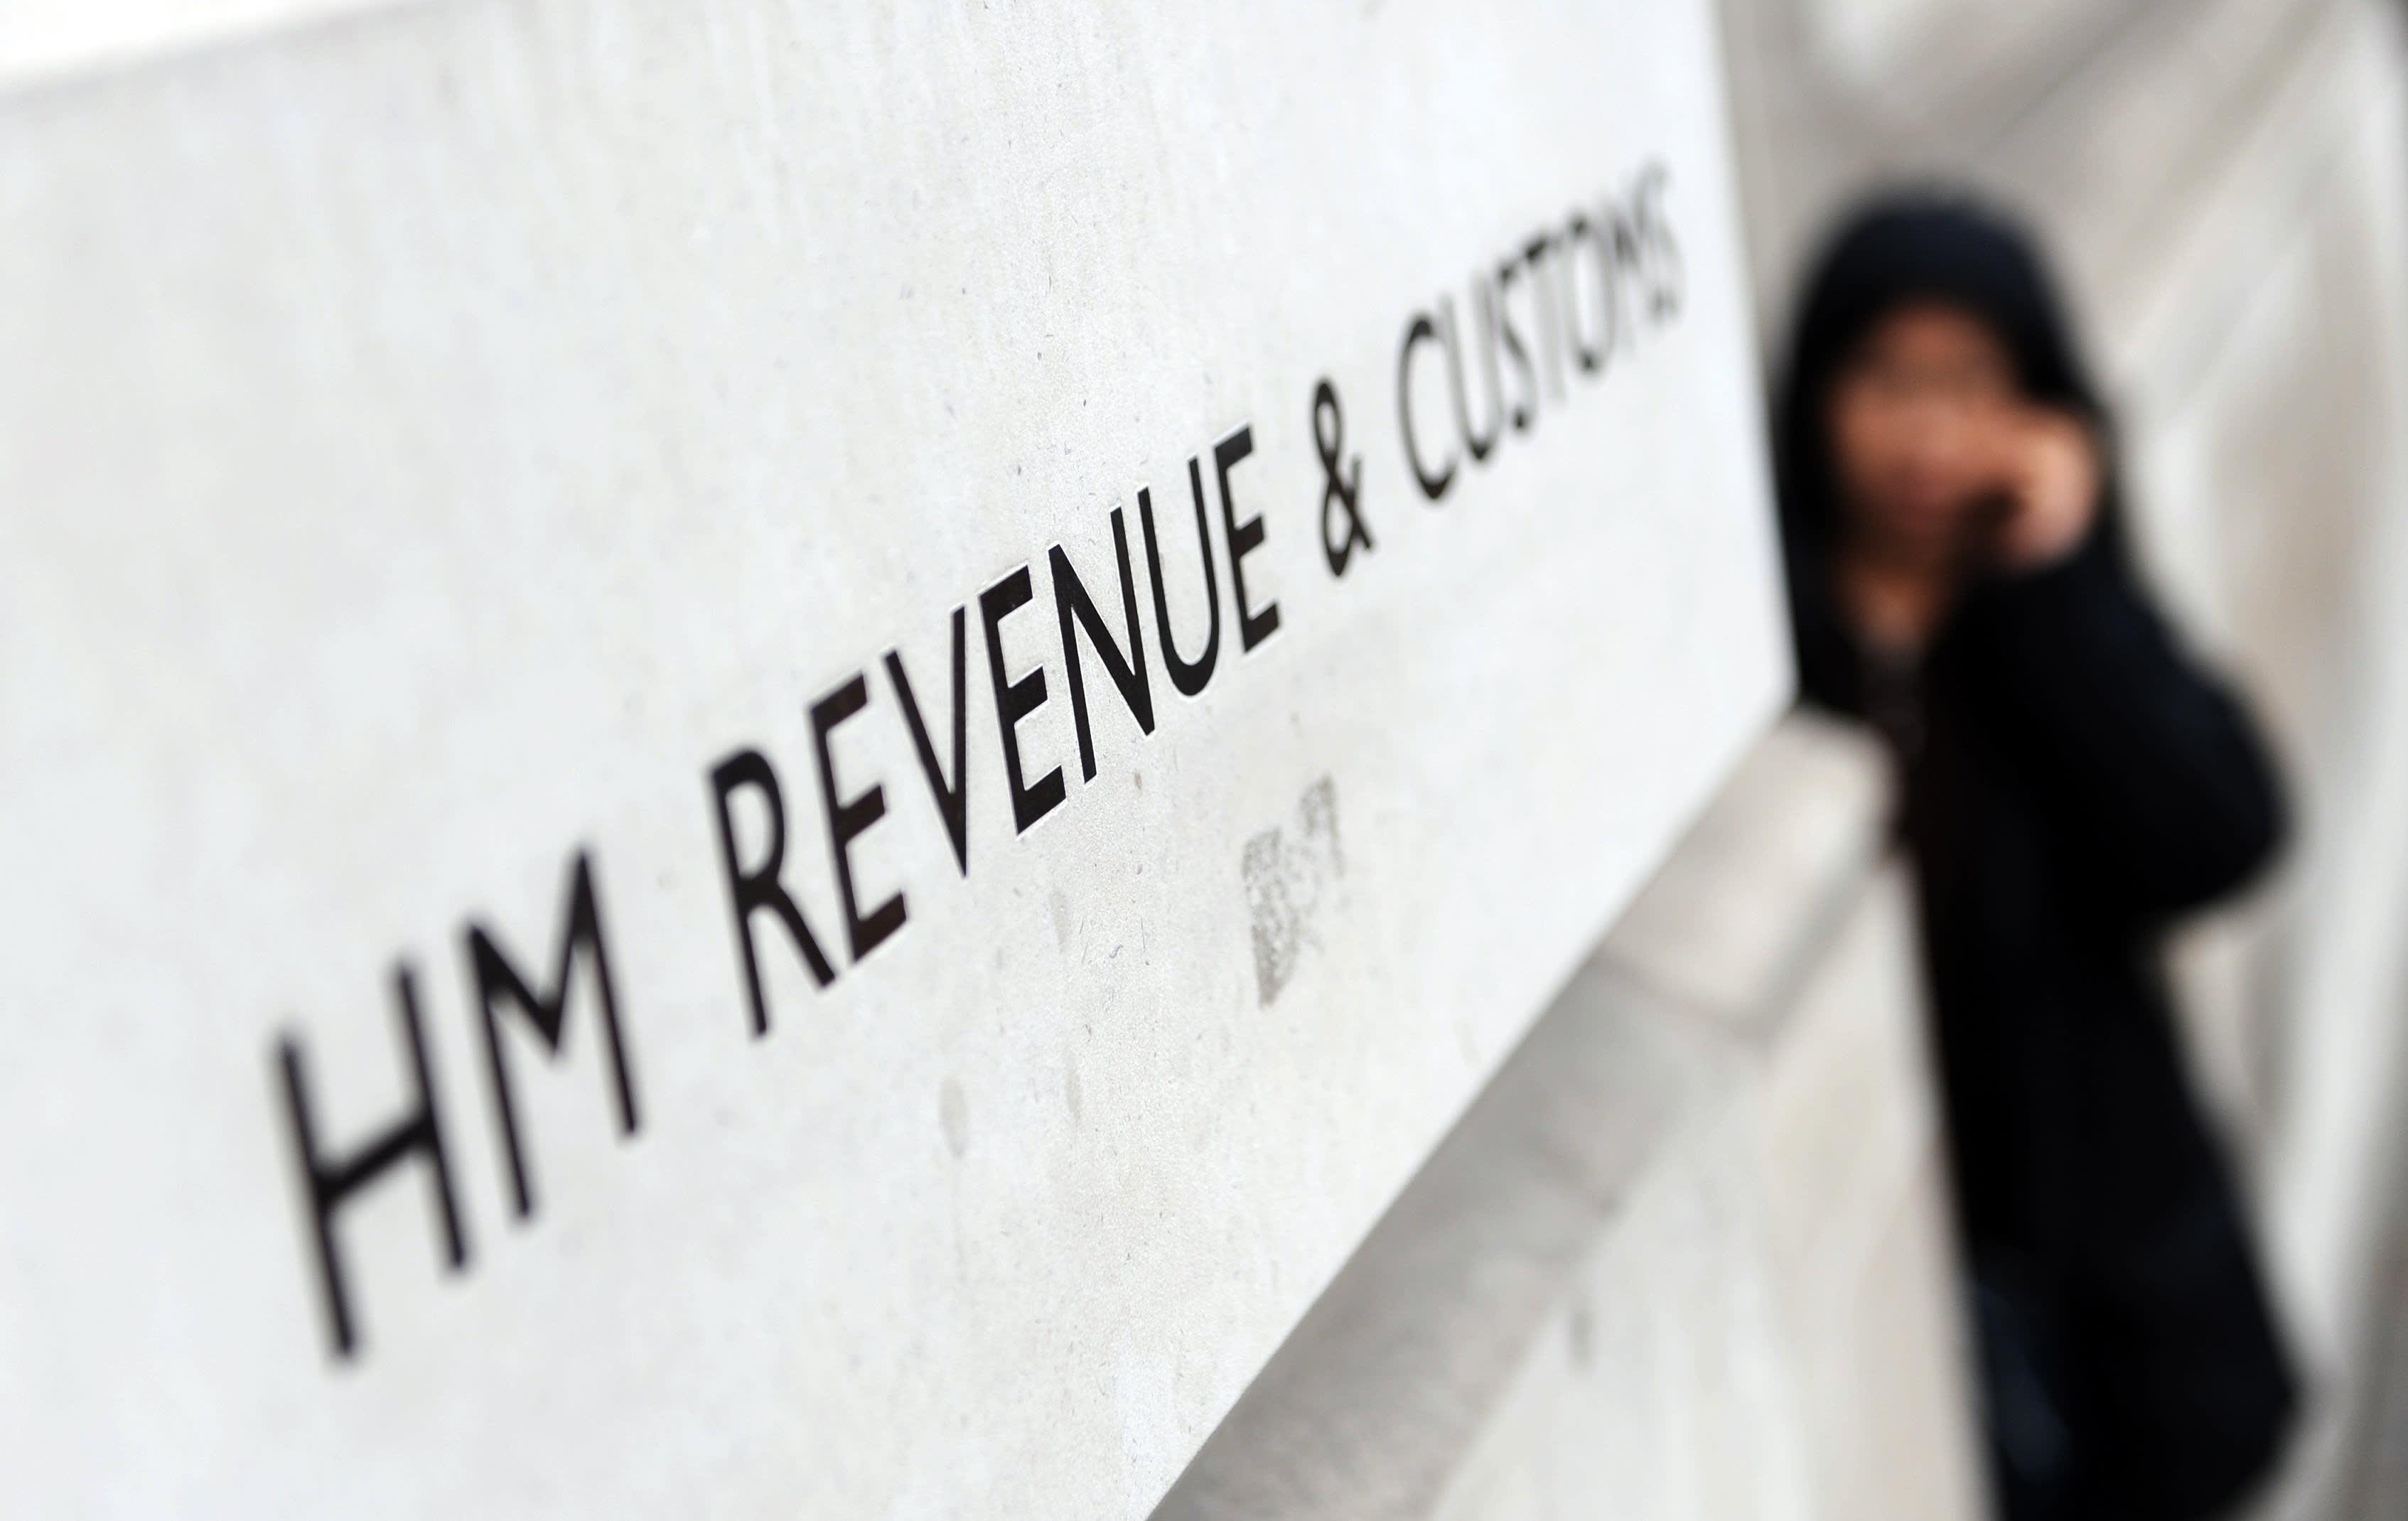 HMRC loses appeal against TV presenter in IR35 case